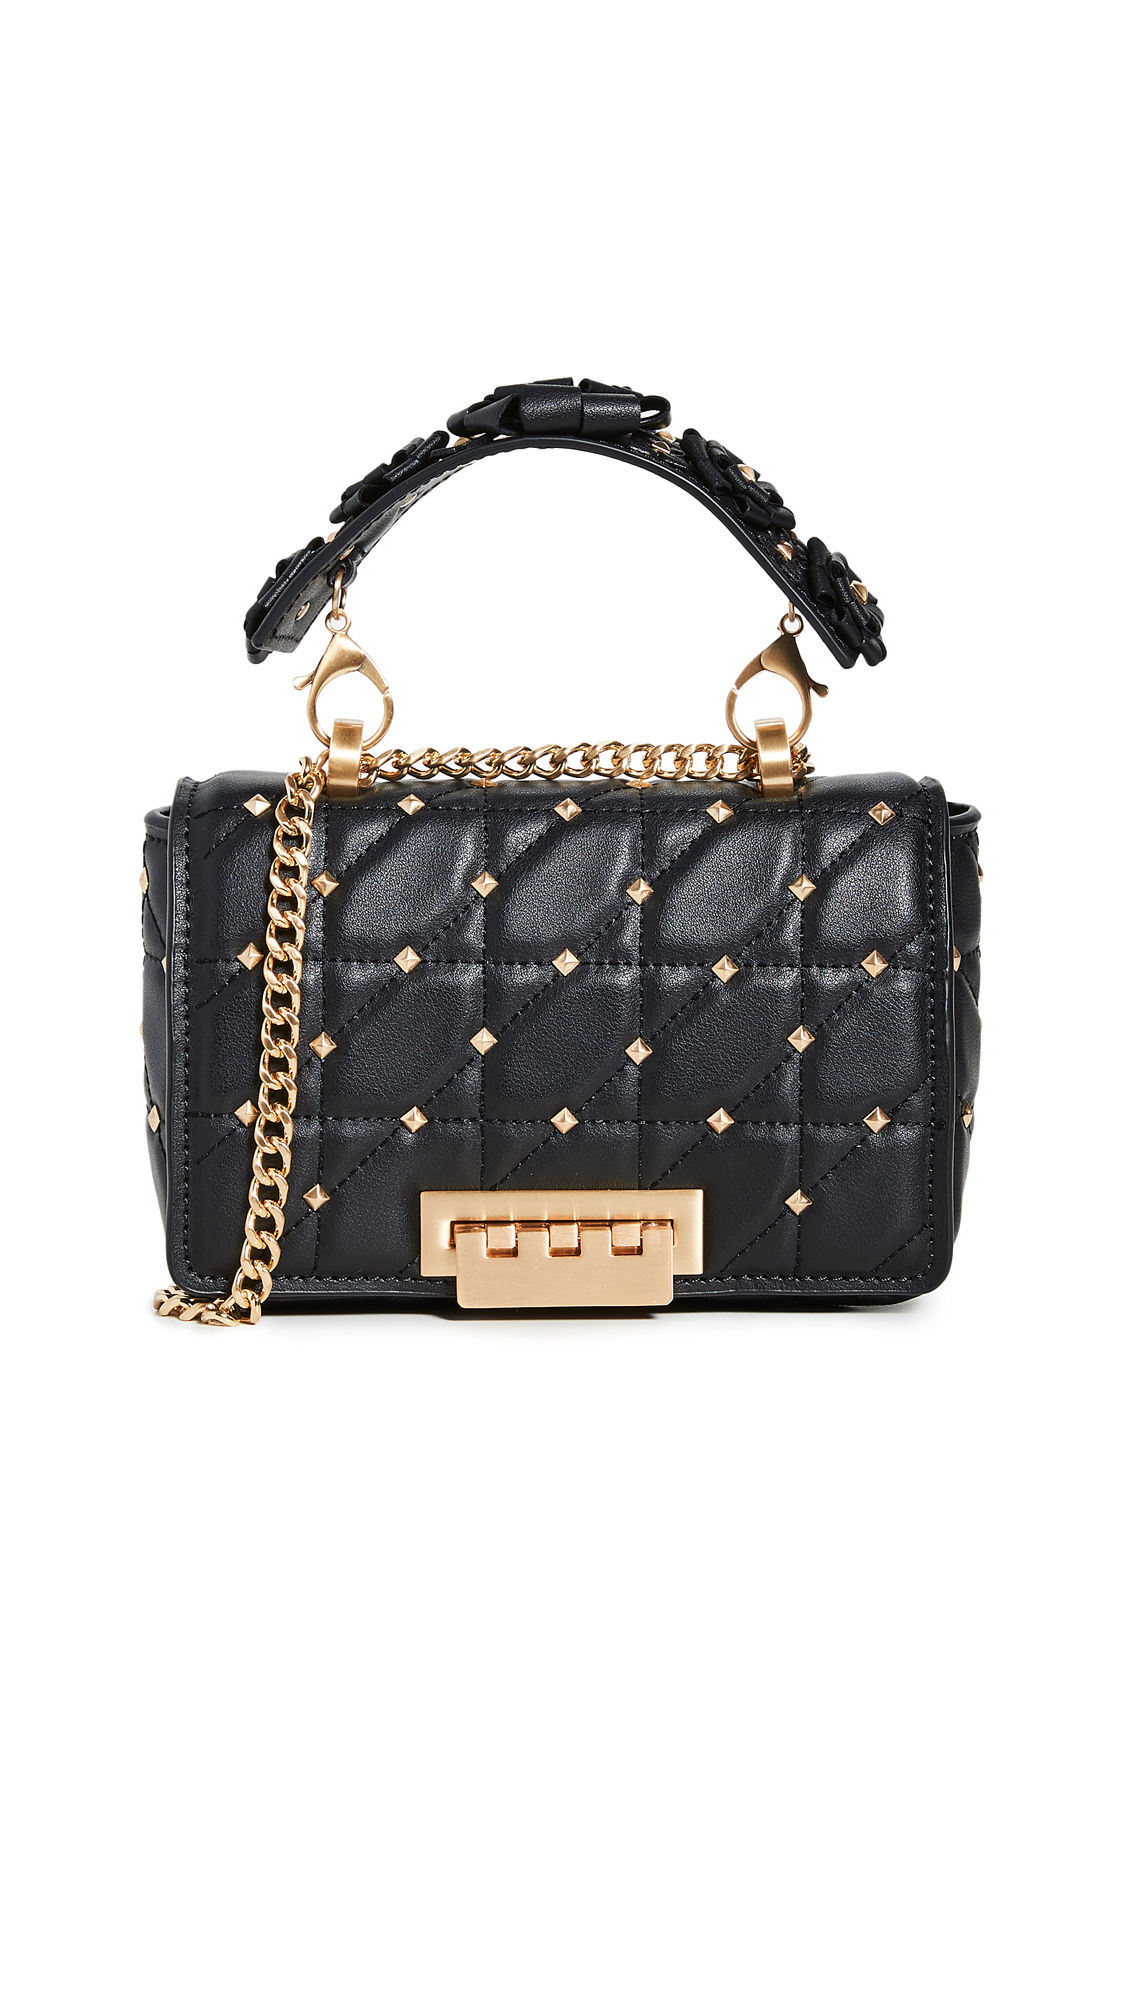 Zac Zac Posen Earthette Small Chain Shoulder Bag In Black